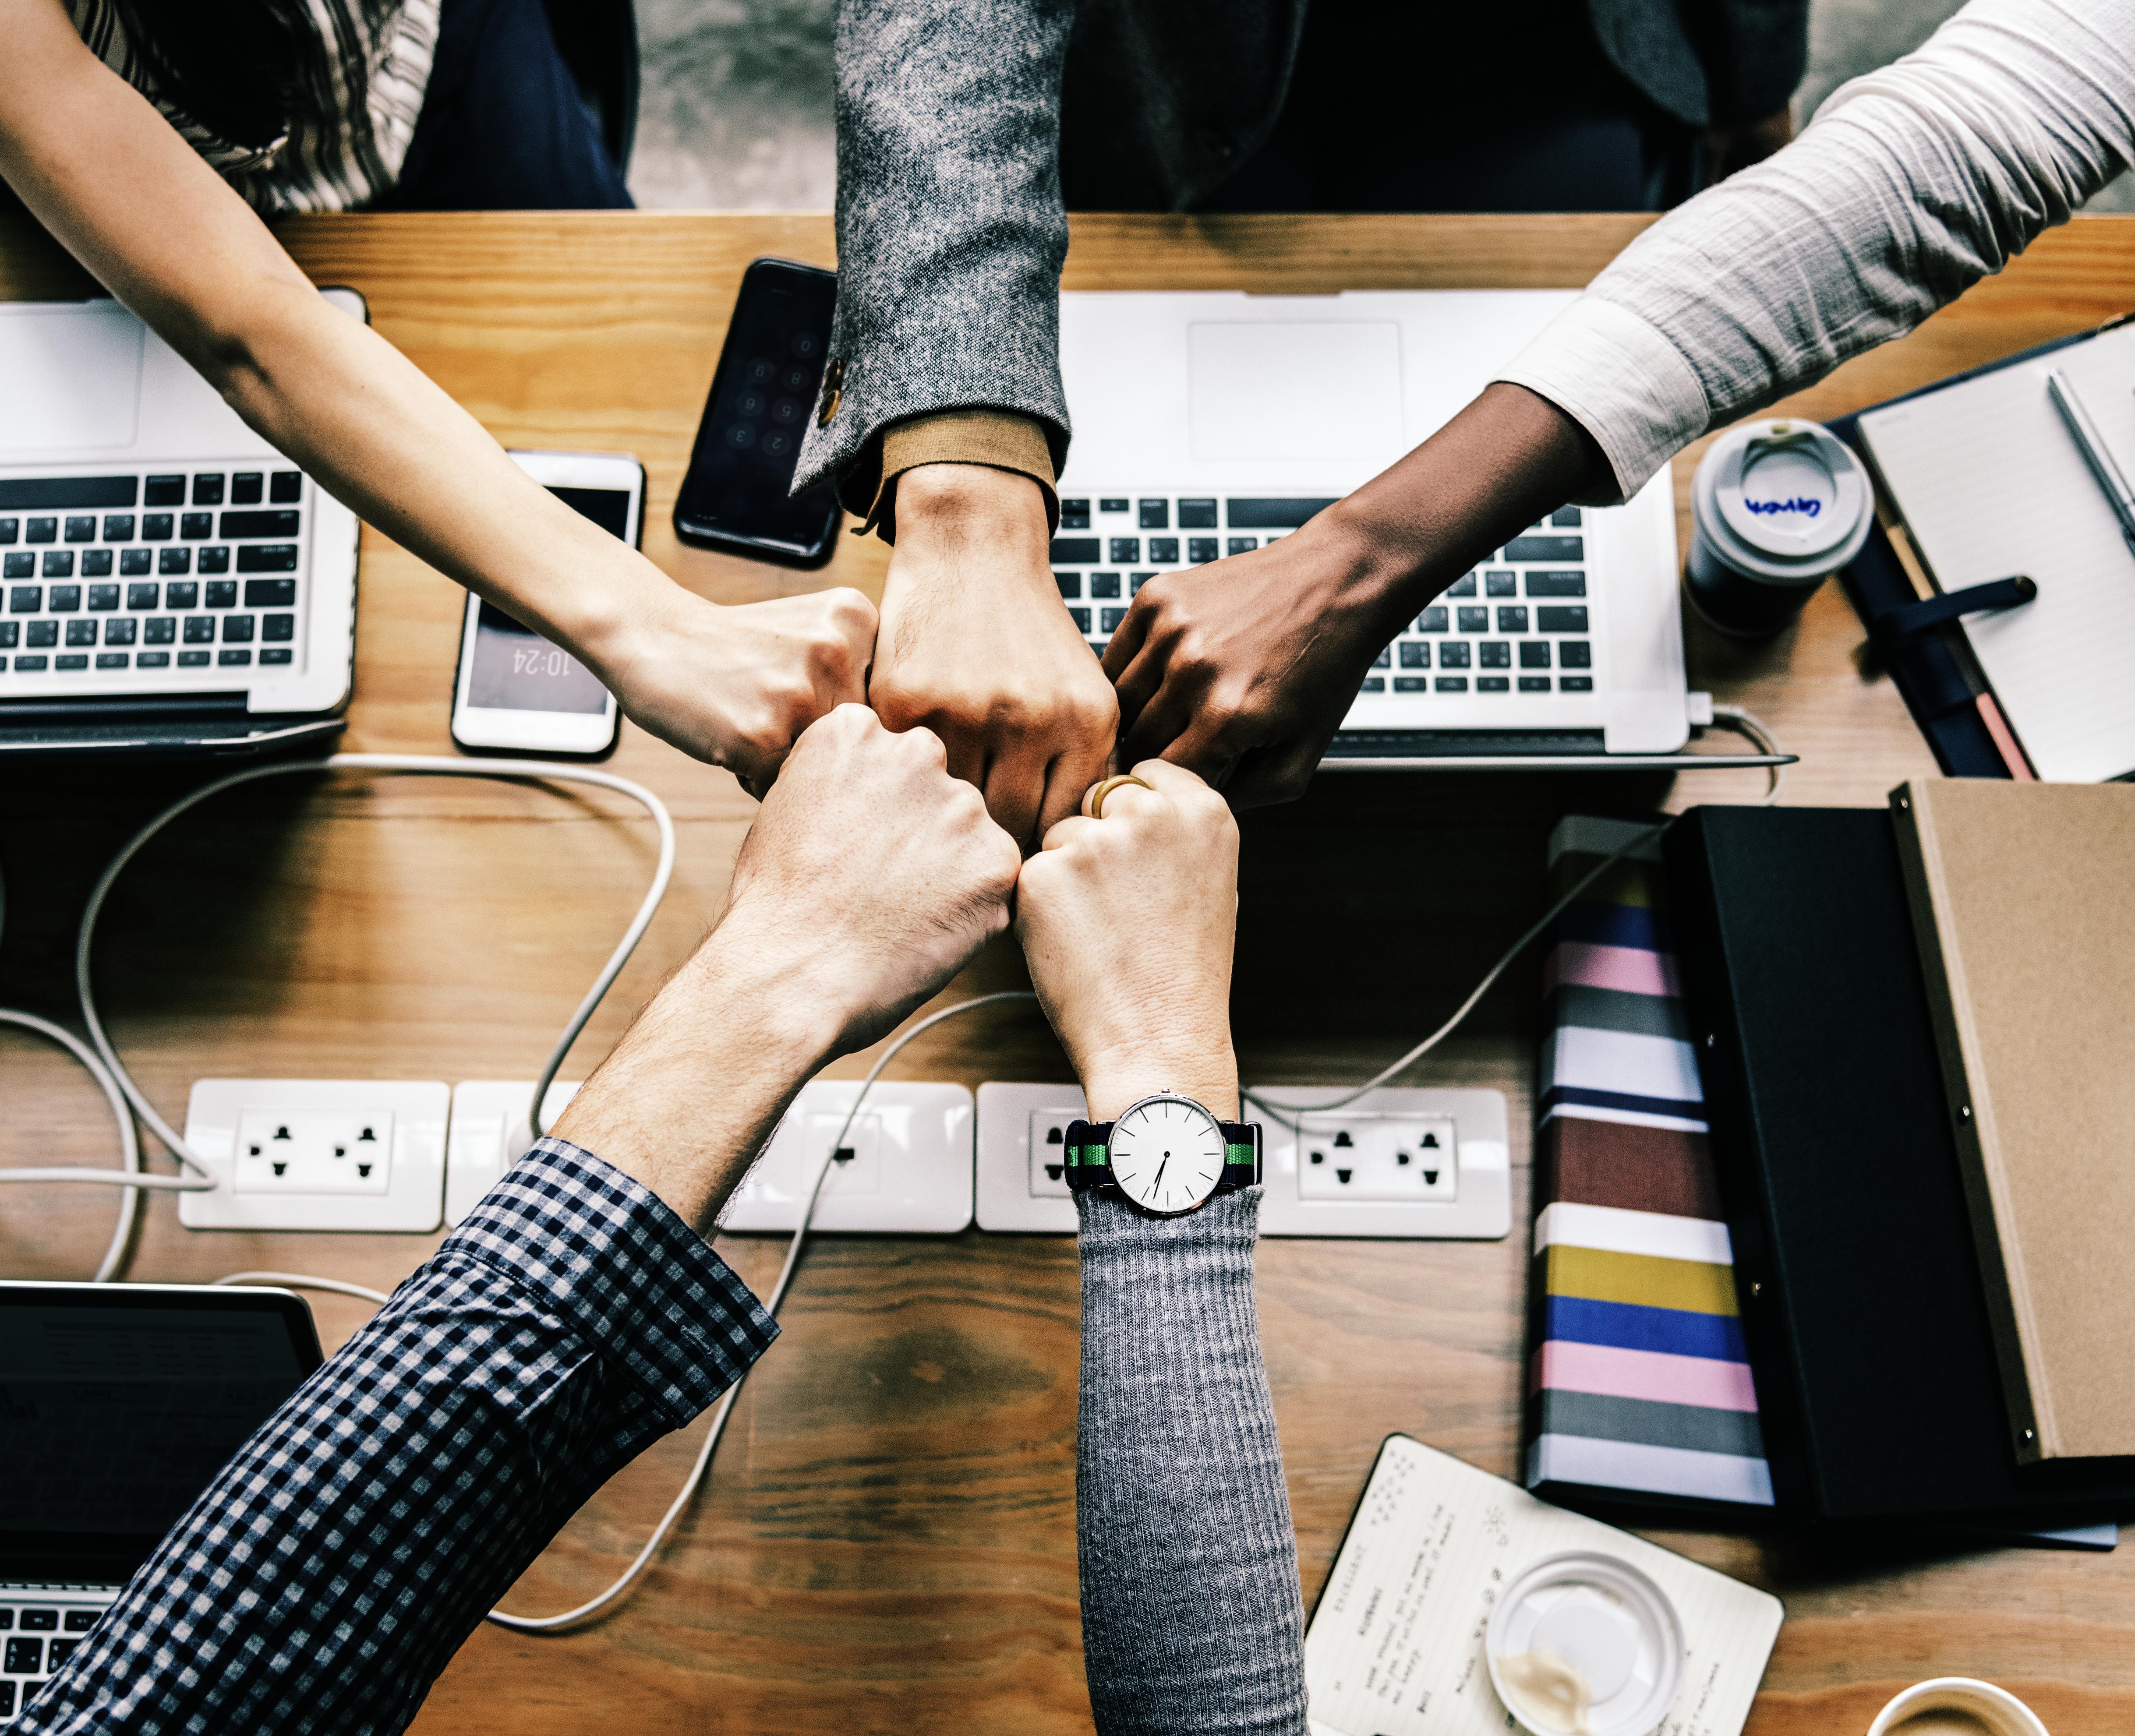 build an enviable employment brand